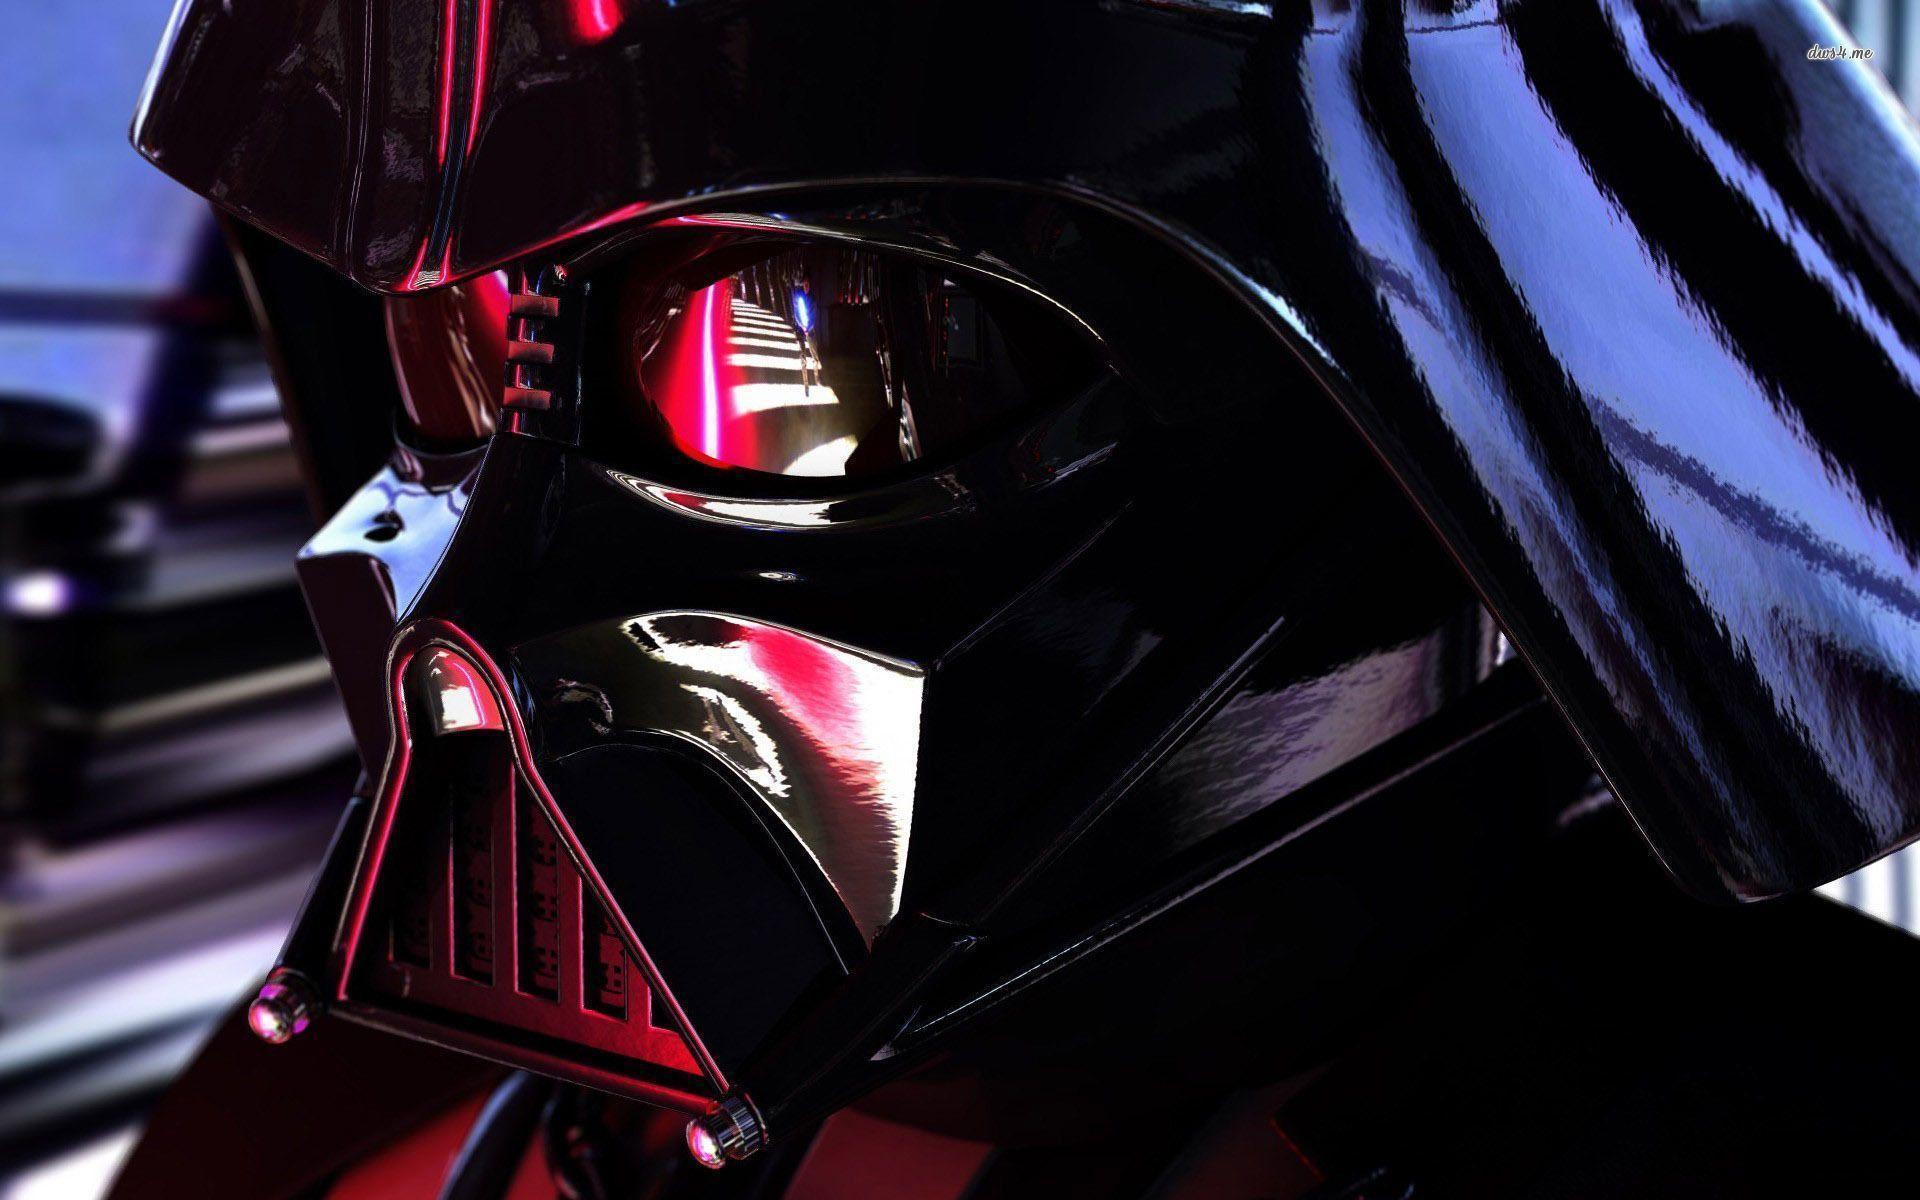 Darth Vader Wallpapers - Wallpaper Cave